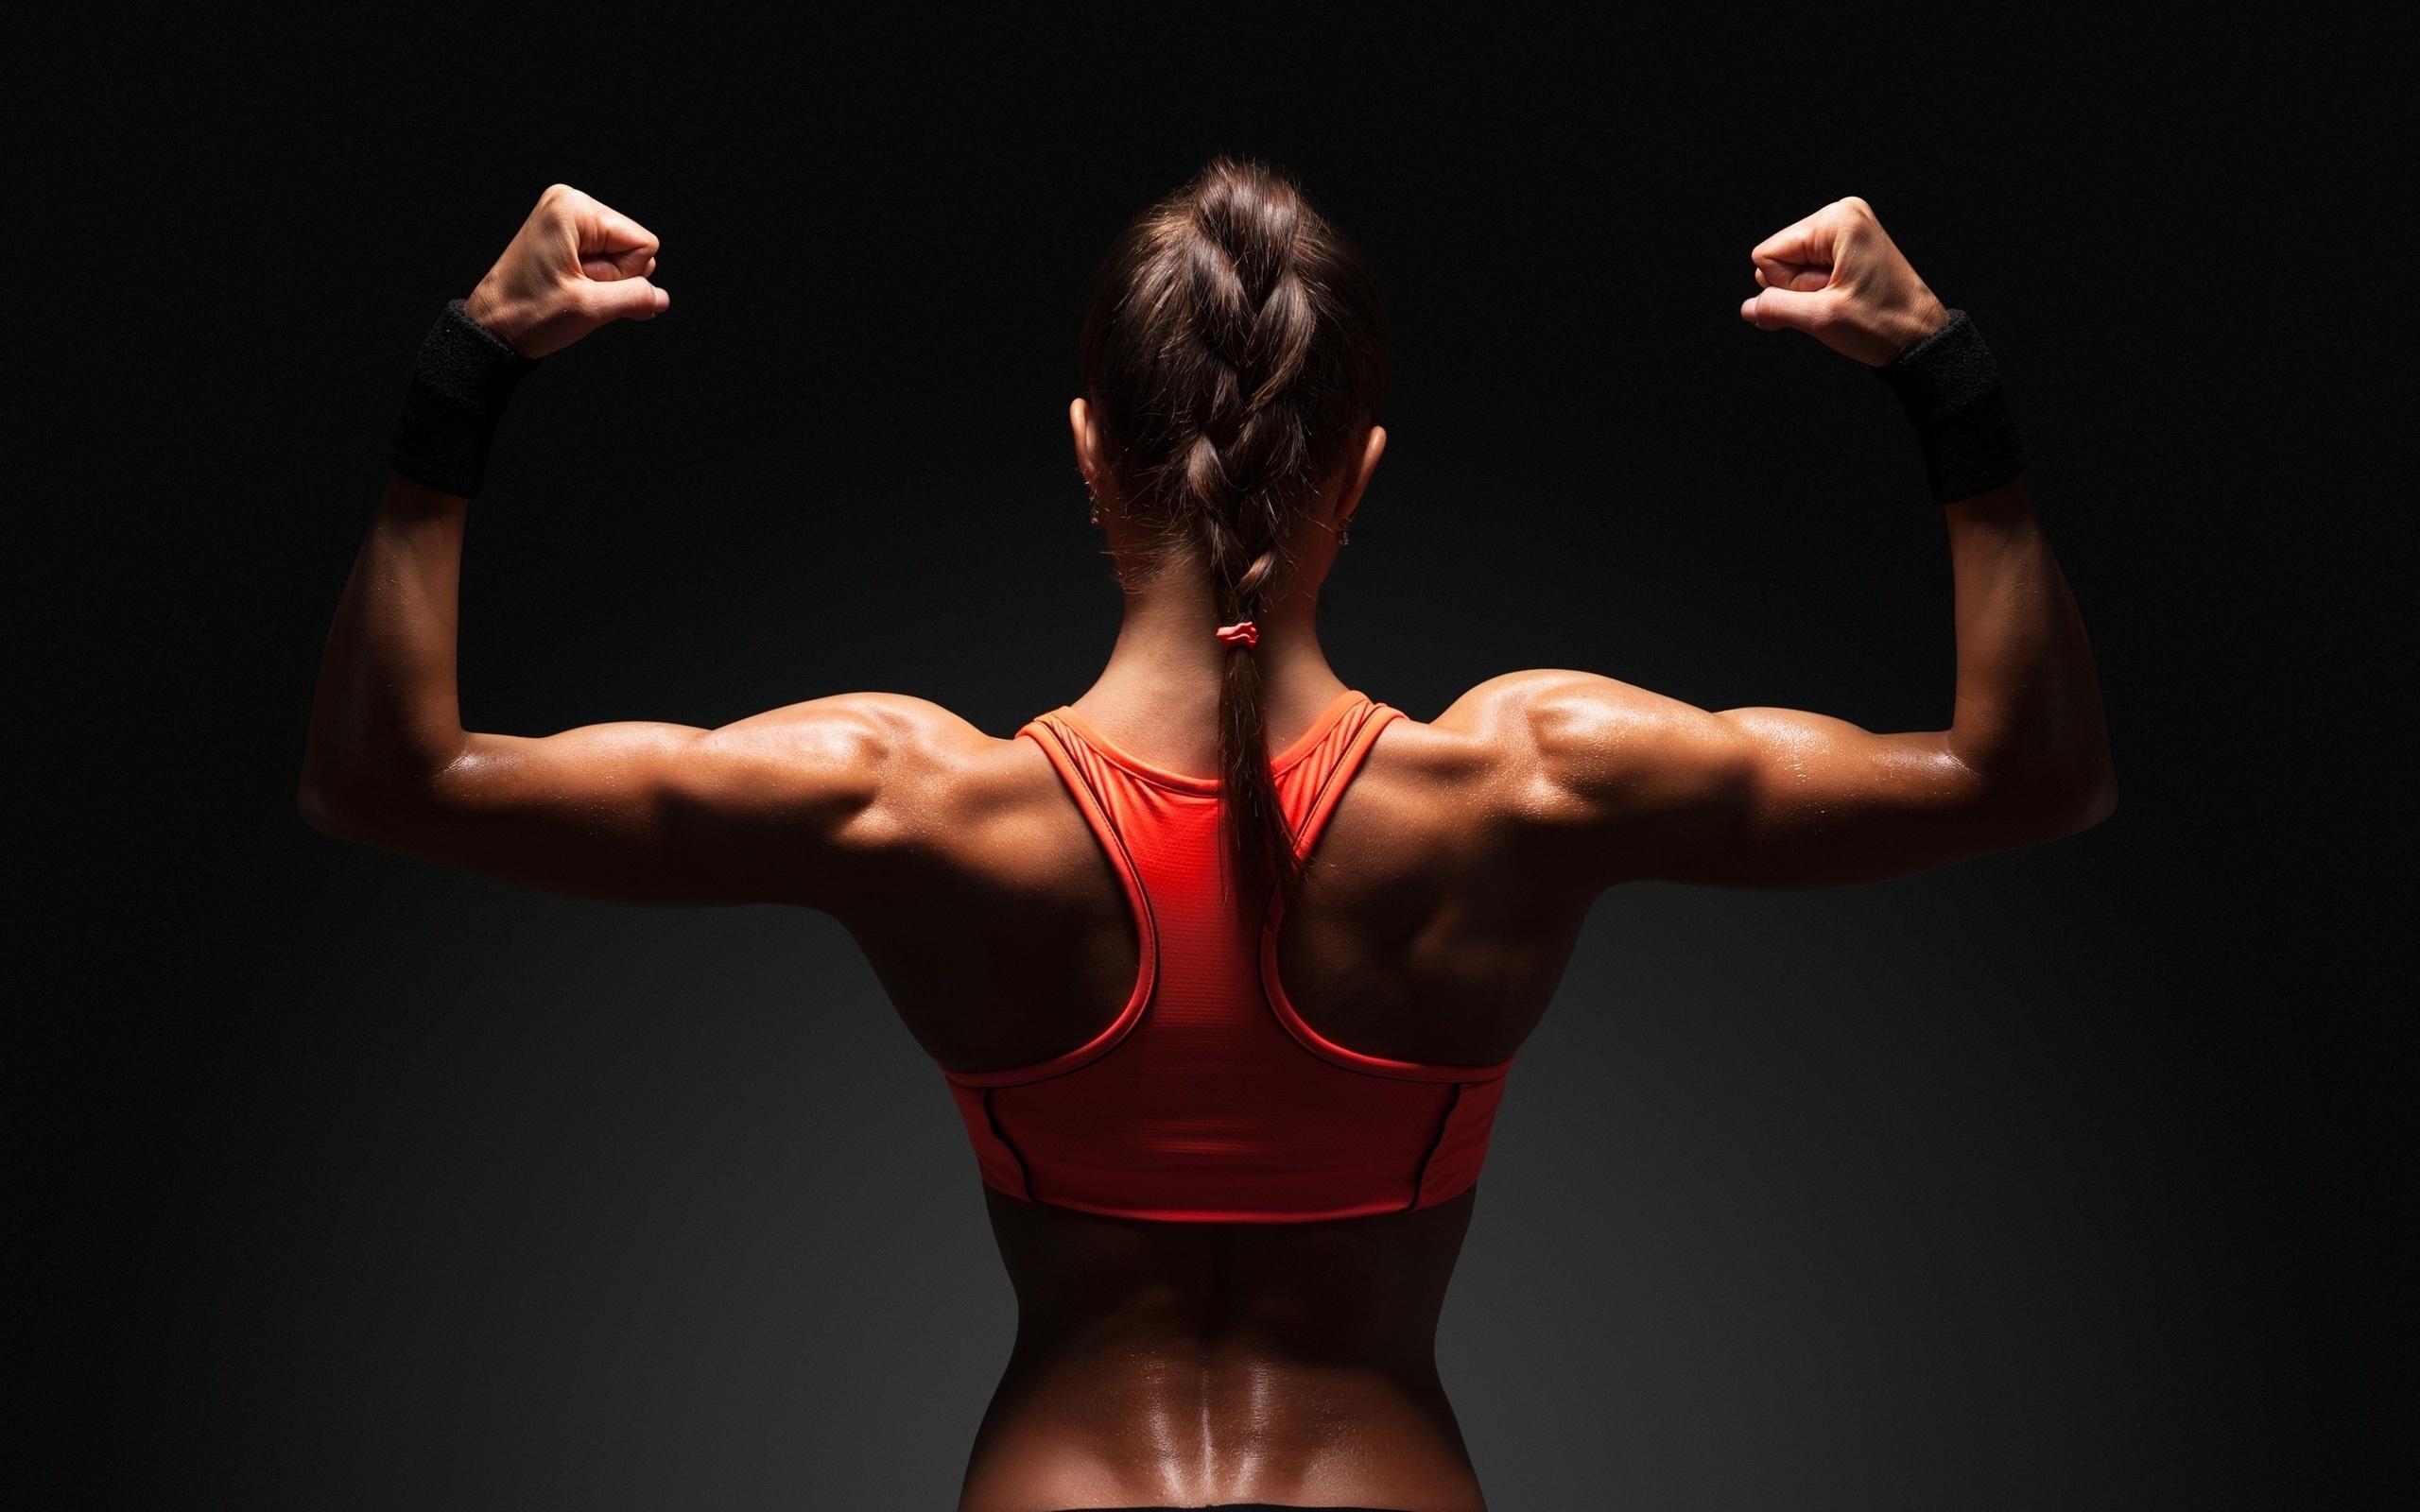 Картинки рабочих мышц